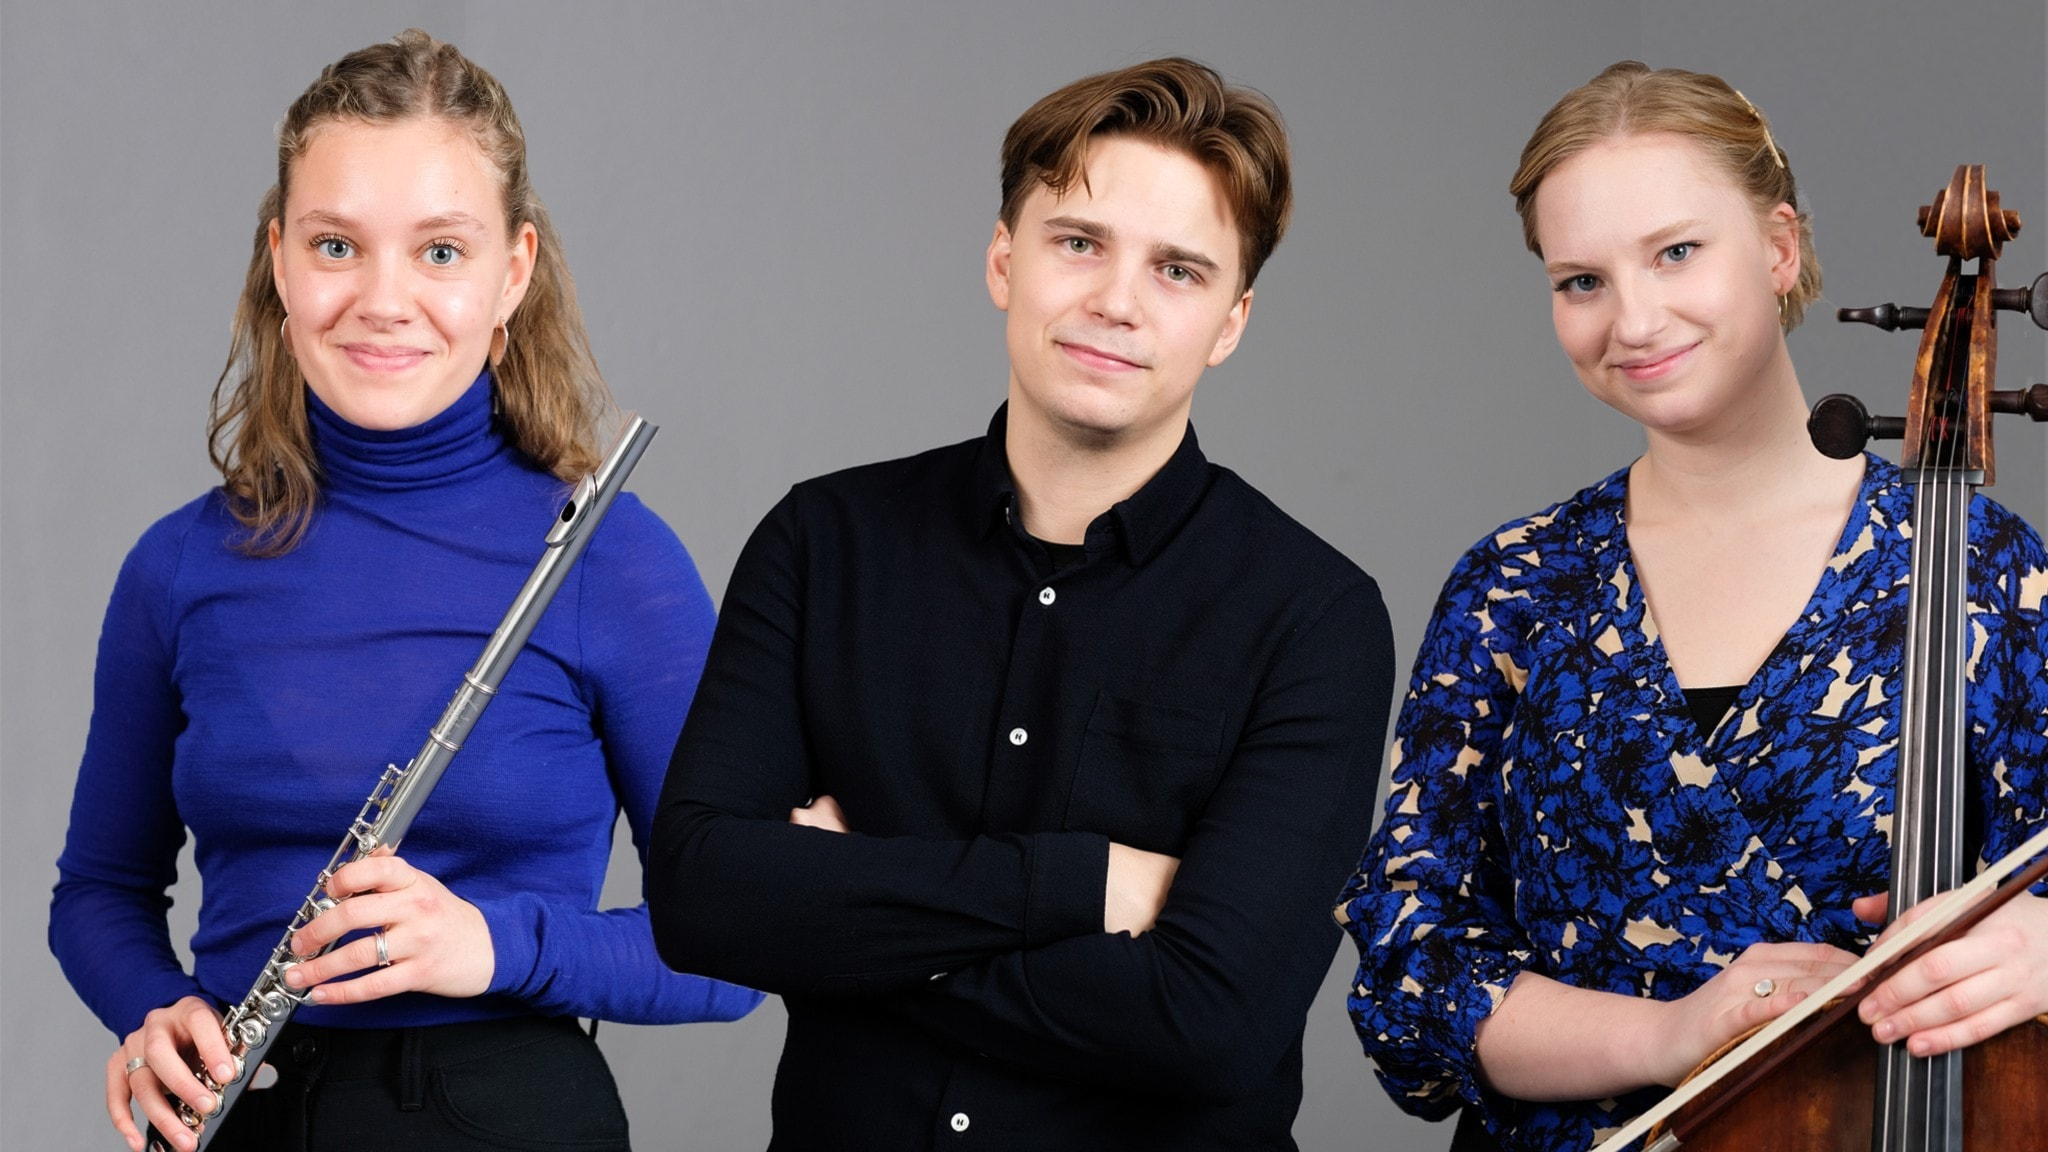 Bild: Laura Michelin, Pontus Carron och Kristina Winiarski.